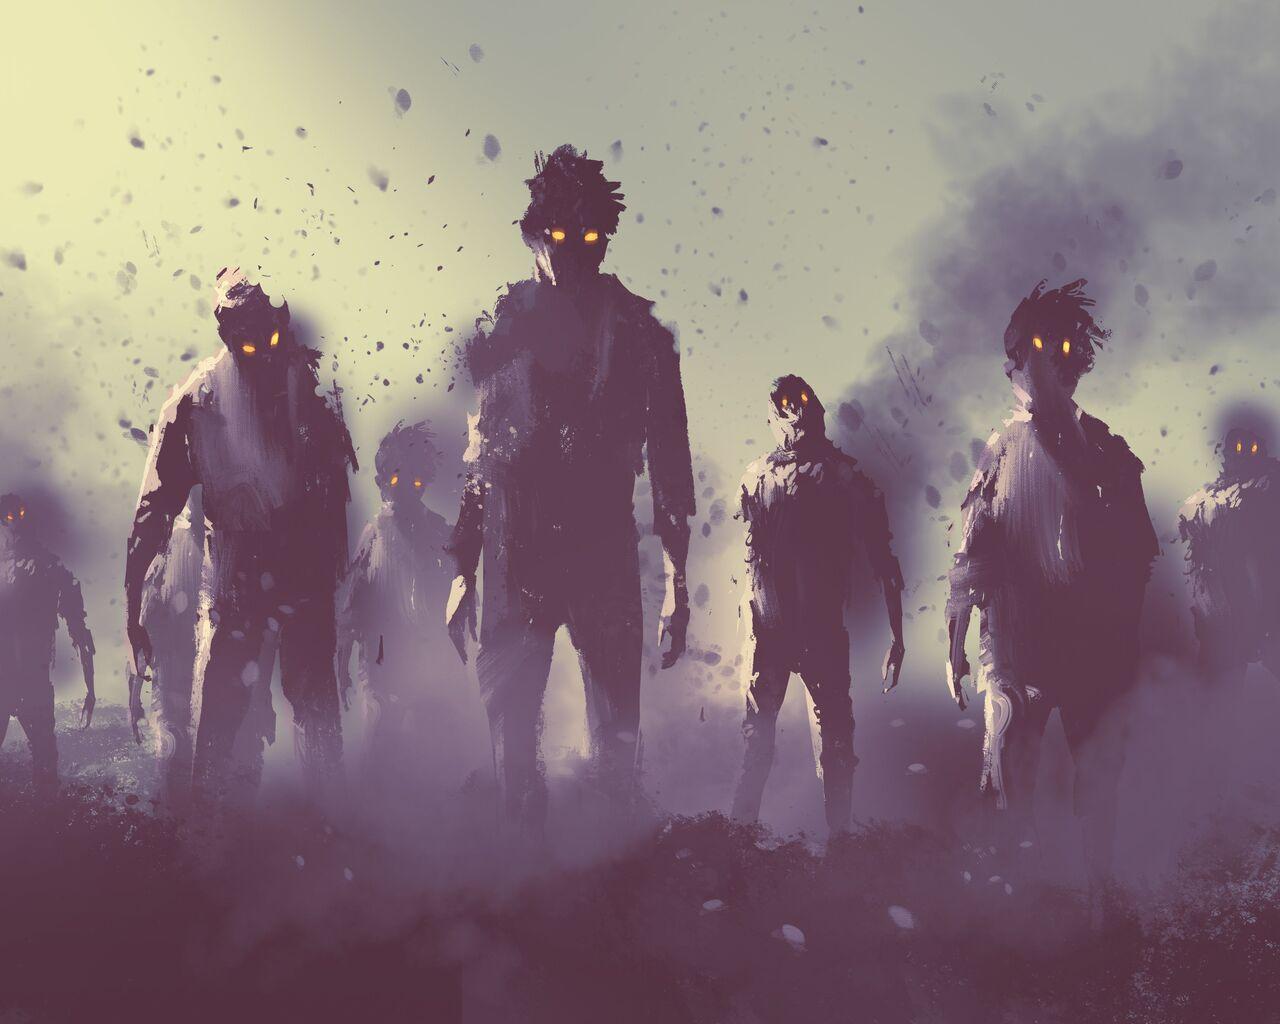 evil-zombie-concept-art-h6.jpg